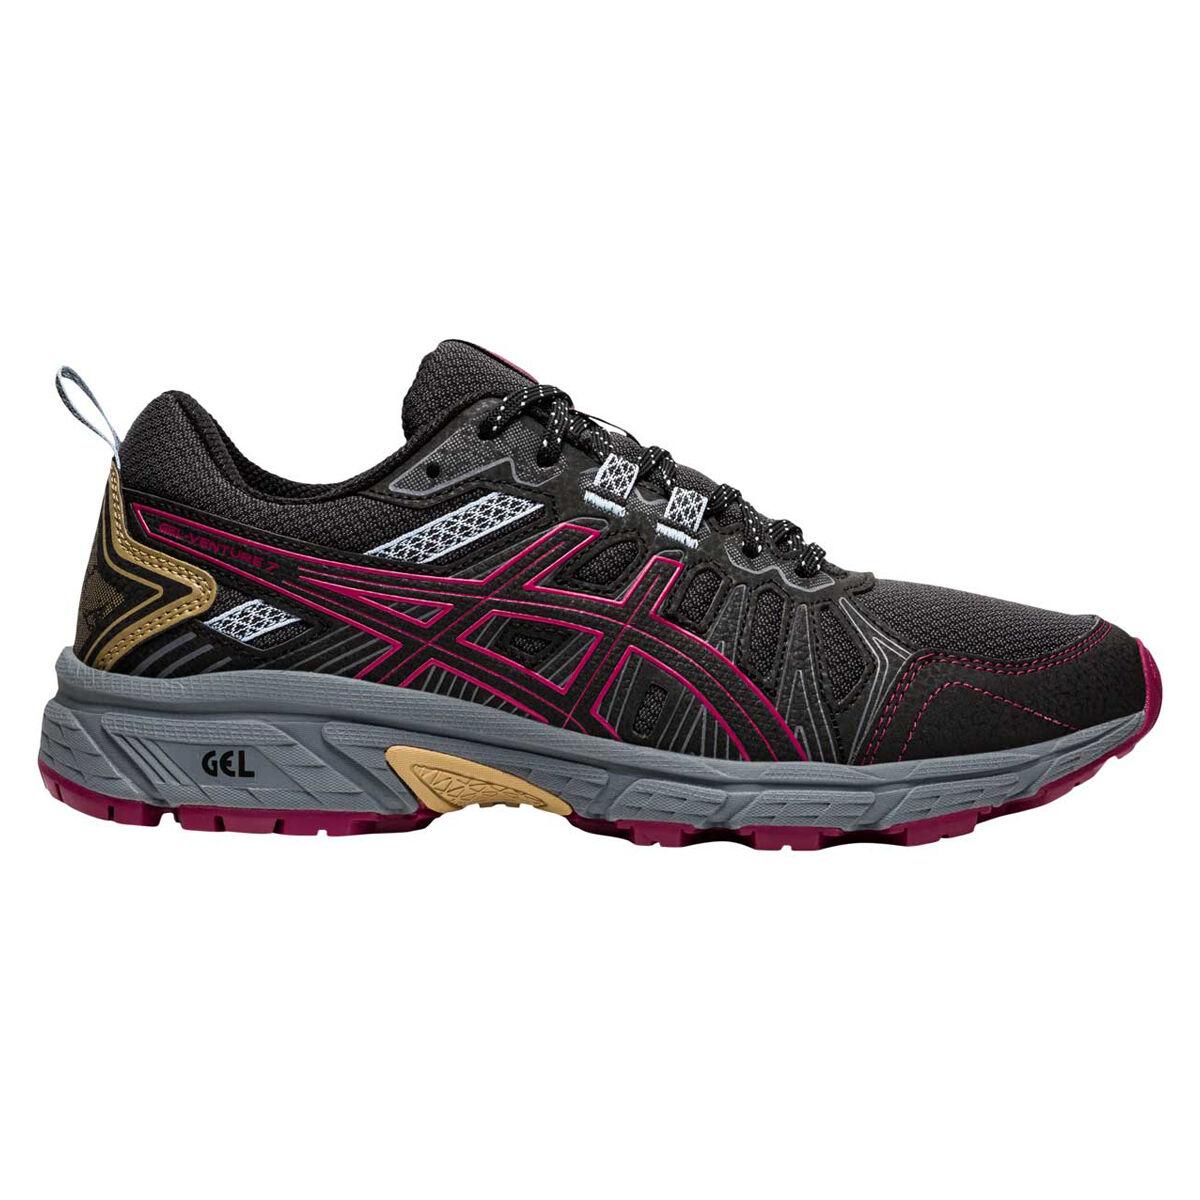 Womens Trail Shoes rebel